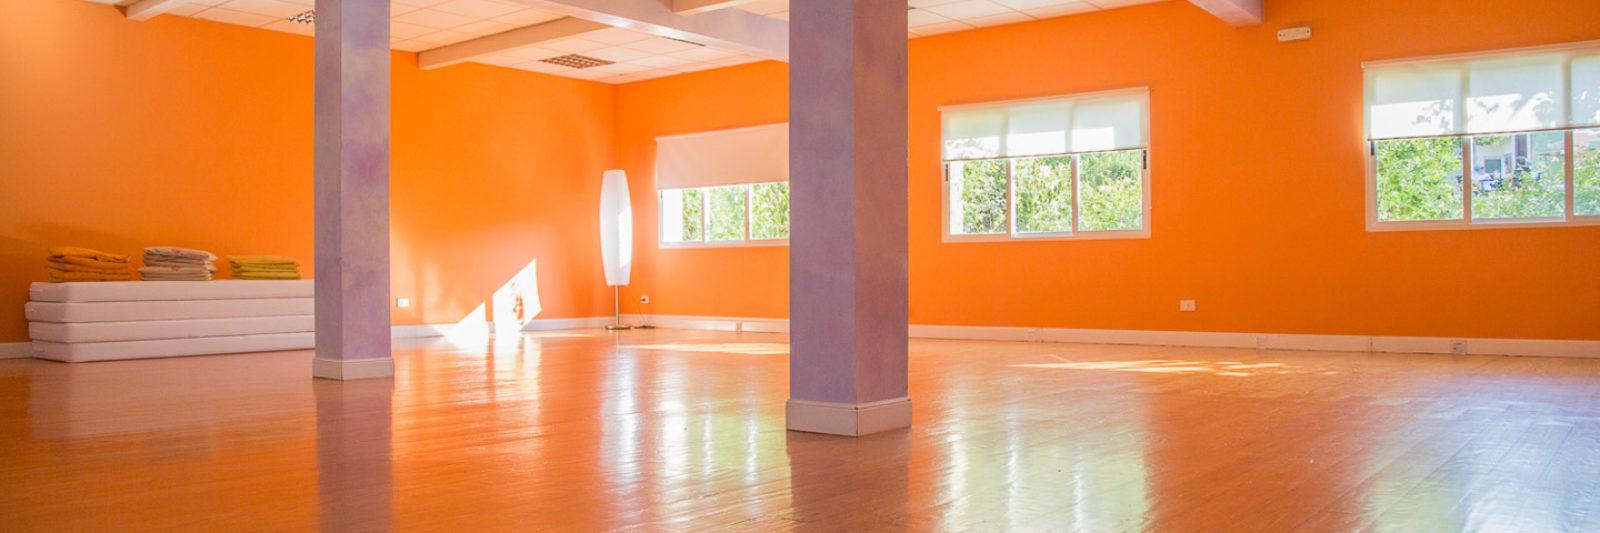 Amalurra Orange Room